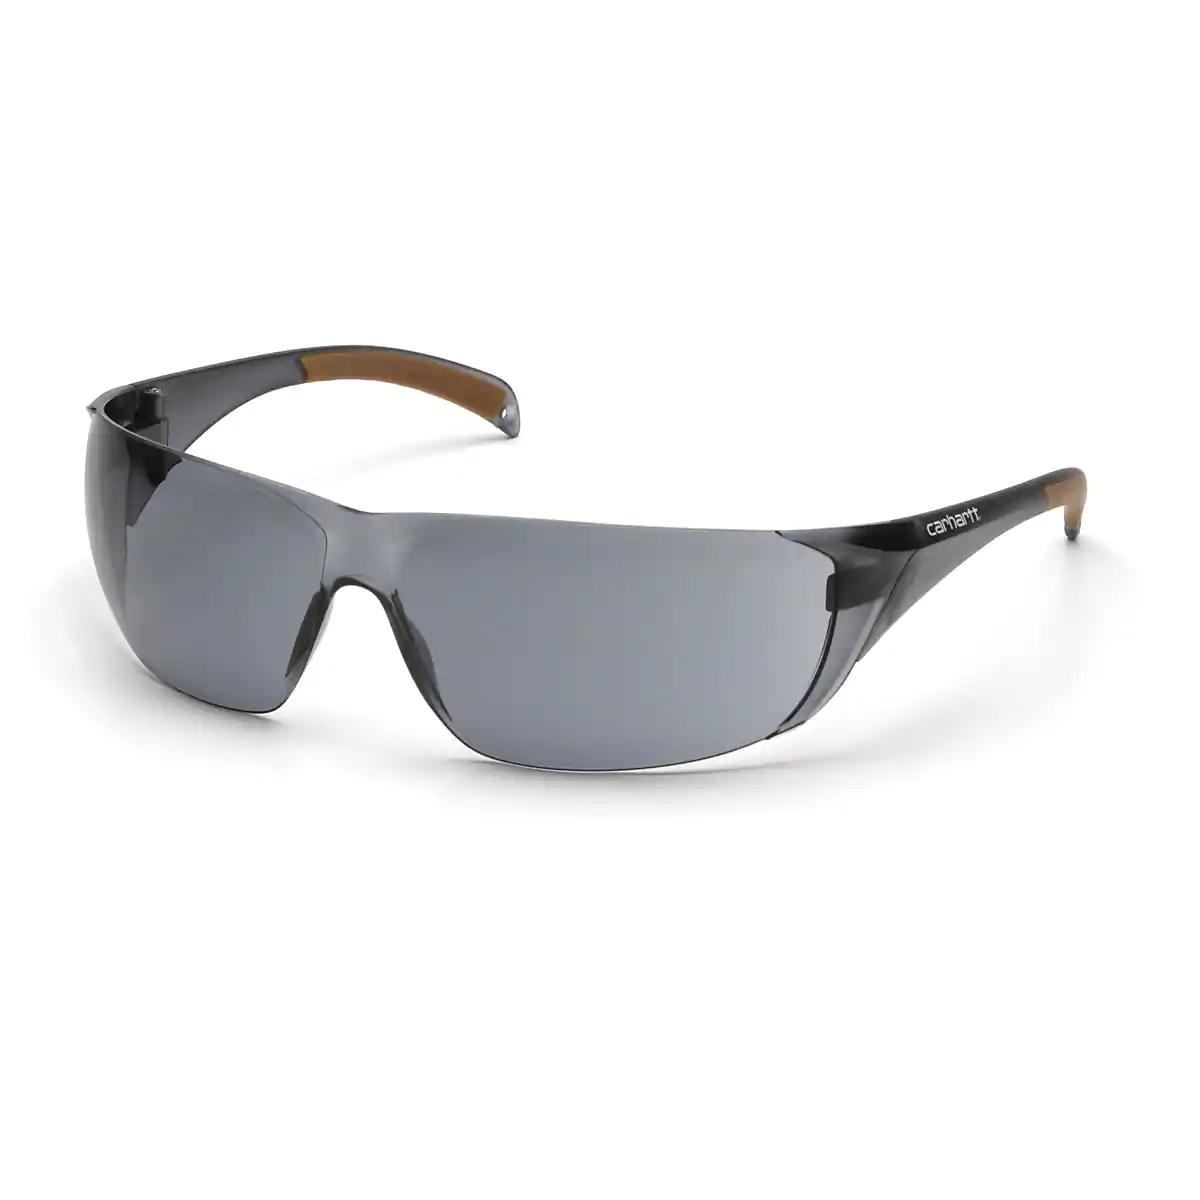 Billings AntiFog Safety Glasses Glasses, Safety, Lens